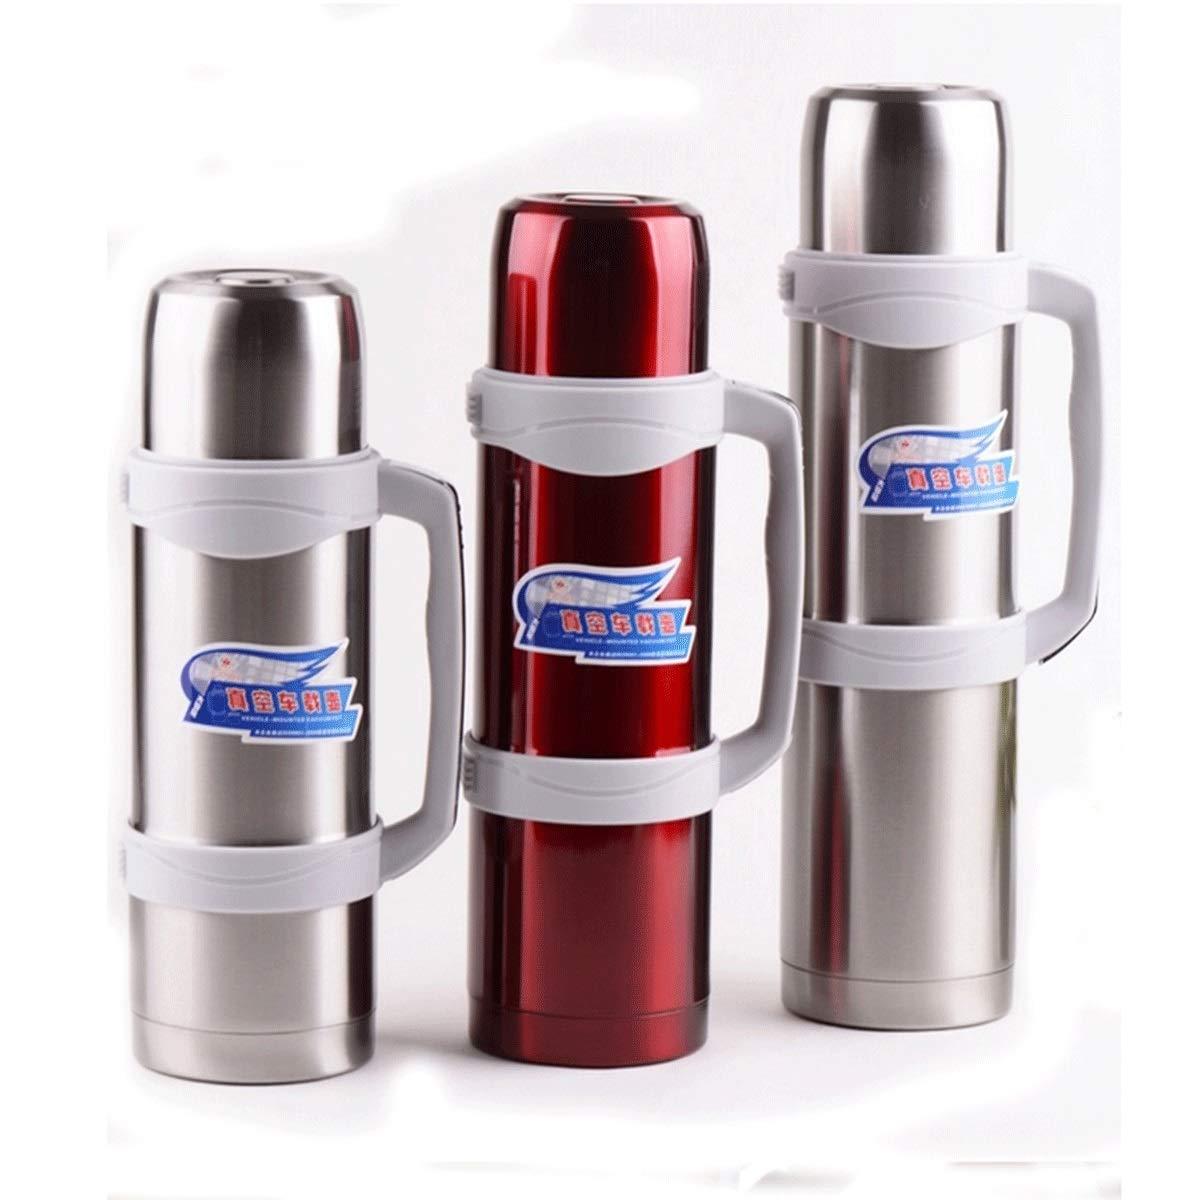 8haowenjuguan カー断熱ポット、大容量、ステンレススチール製真空フラスコ、真空の屋外旅行旅行用湯たんぽ、アウトドア断熱ポット、2.6L / 3.5L / 3.0L、スチールカラー/レッド (Capacity : 3.0L, Color : Steel color) B07R1TC5MW Steel color 3.0L